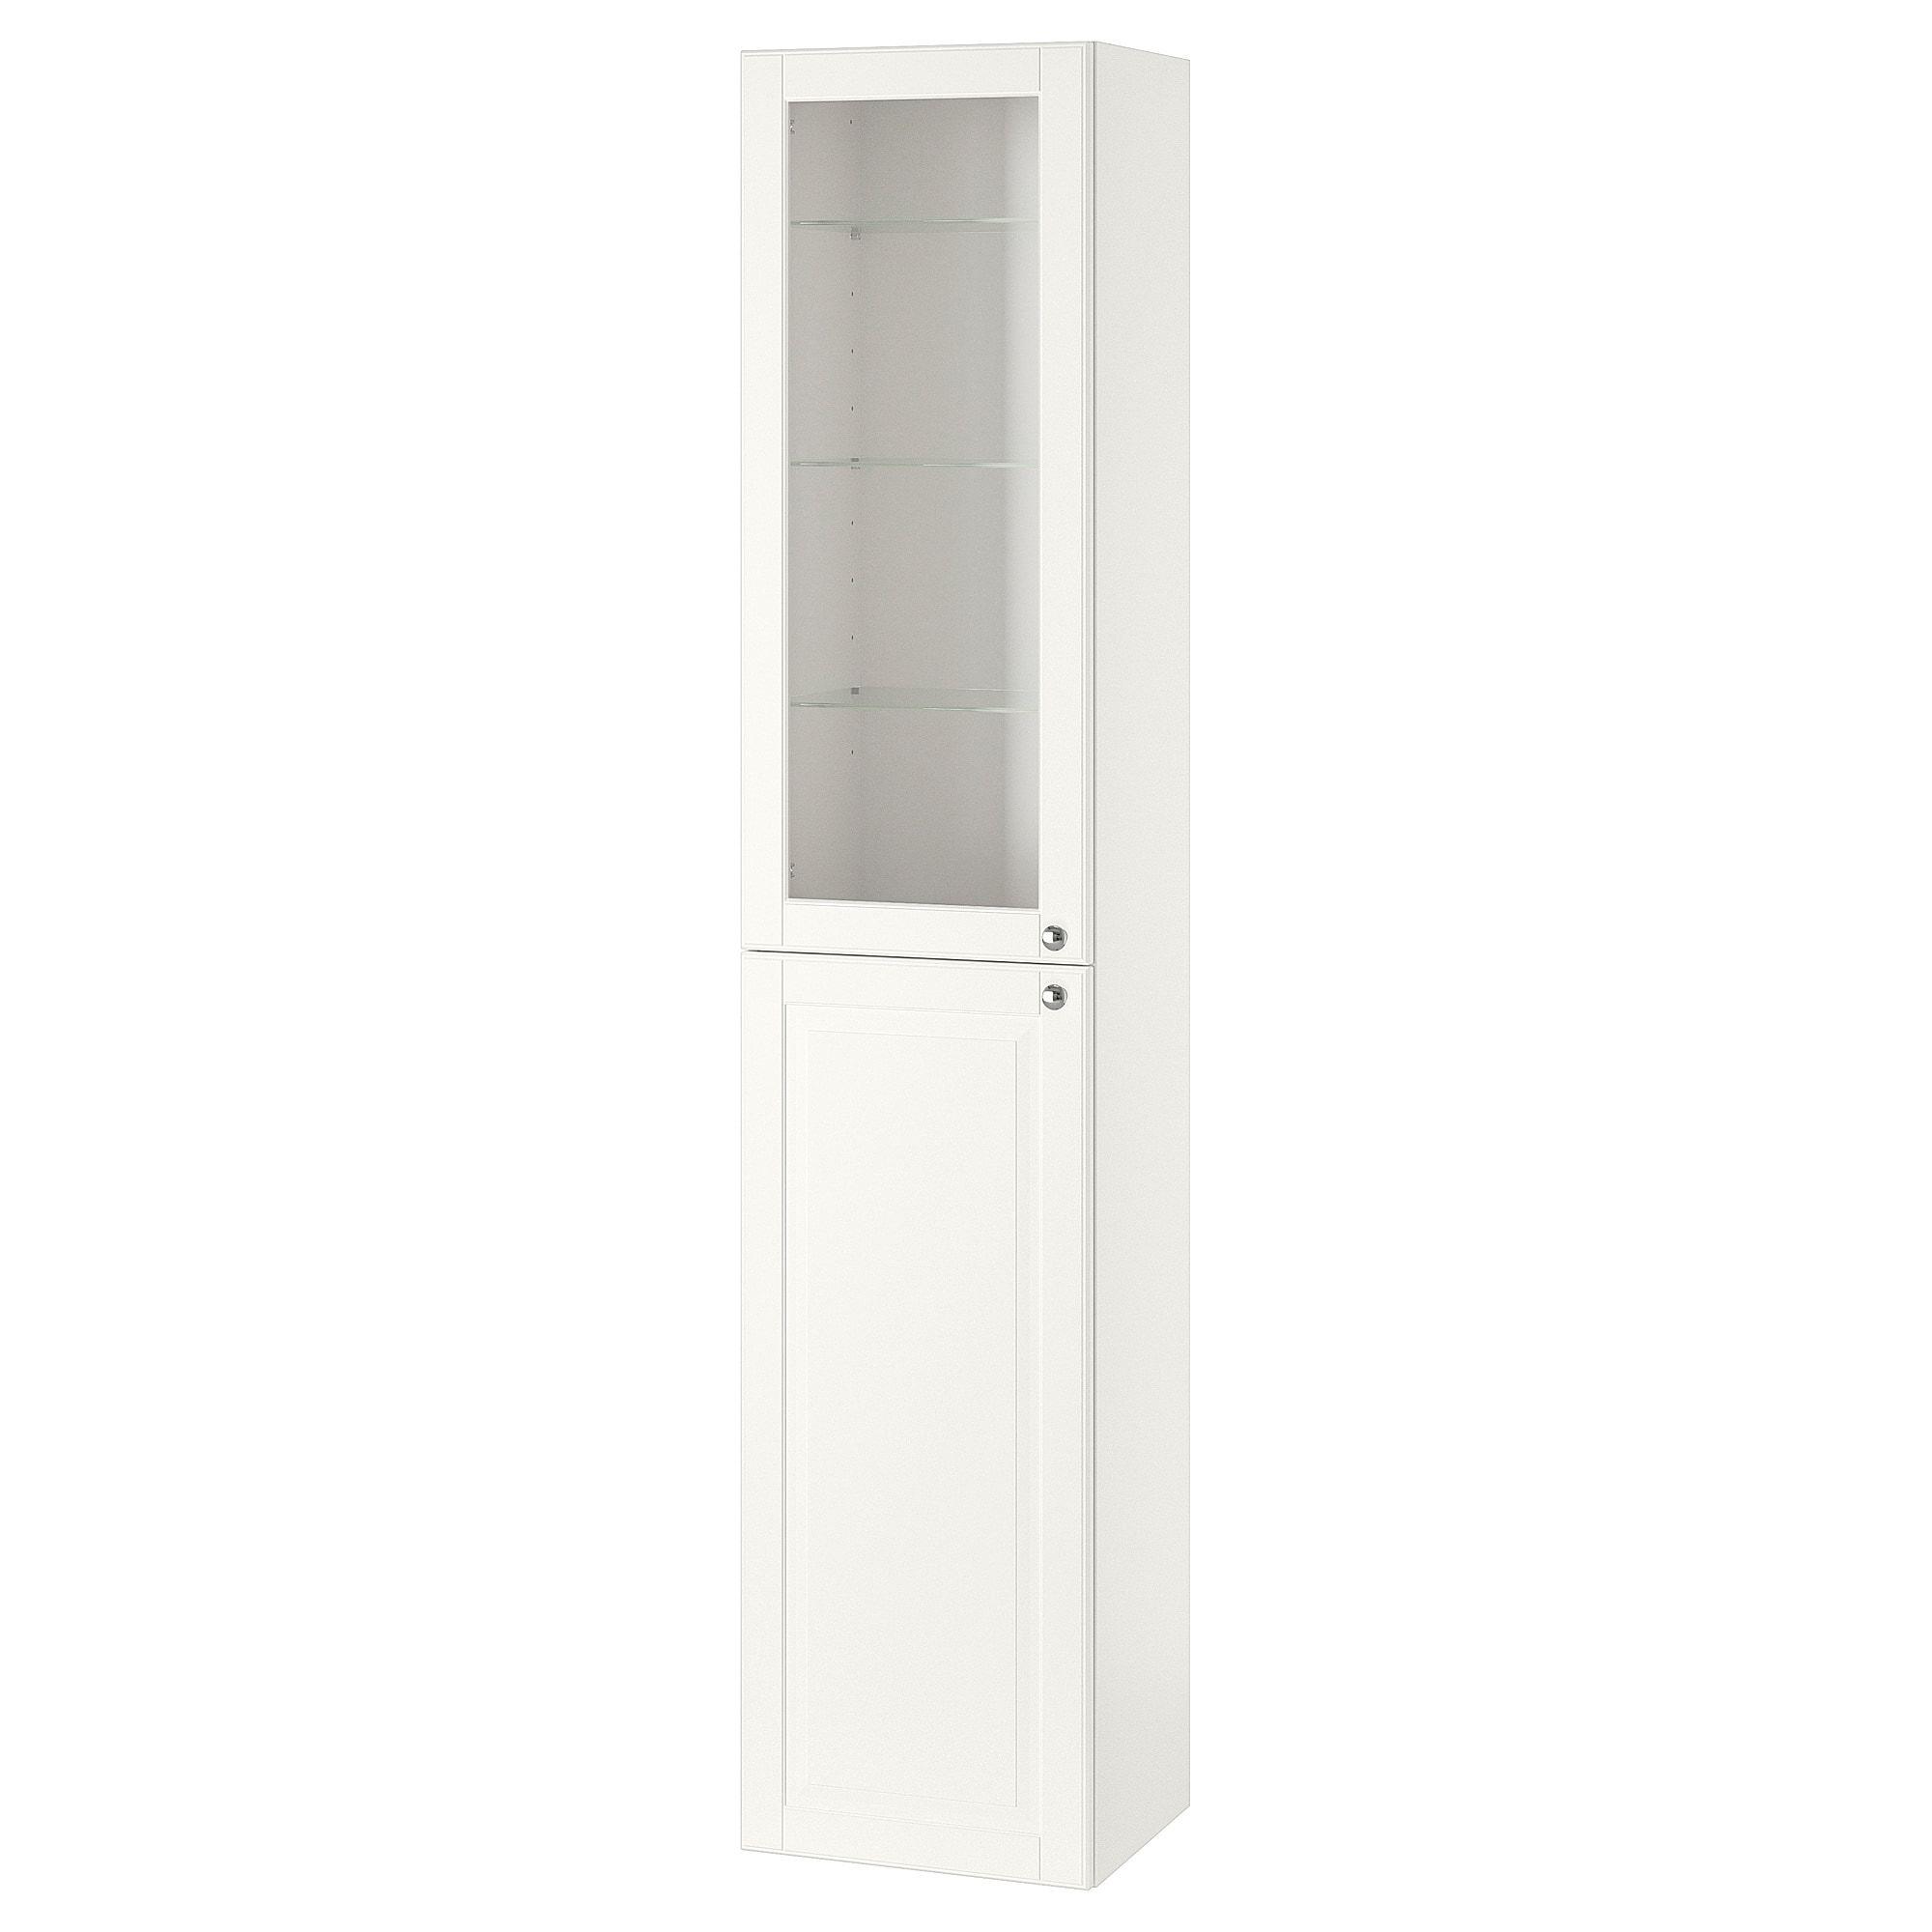 Ikea Godmorgon Kasjon White High Cabinet Ikea Glass Door Tall Cabinet Storage